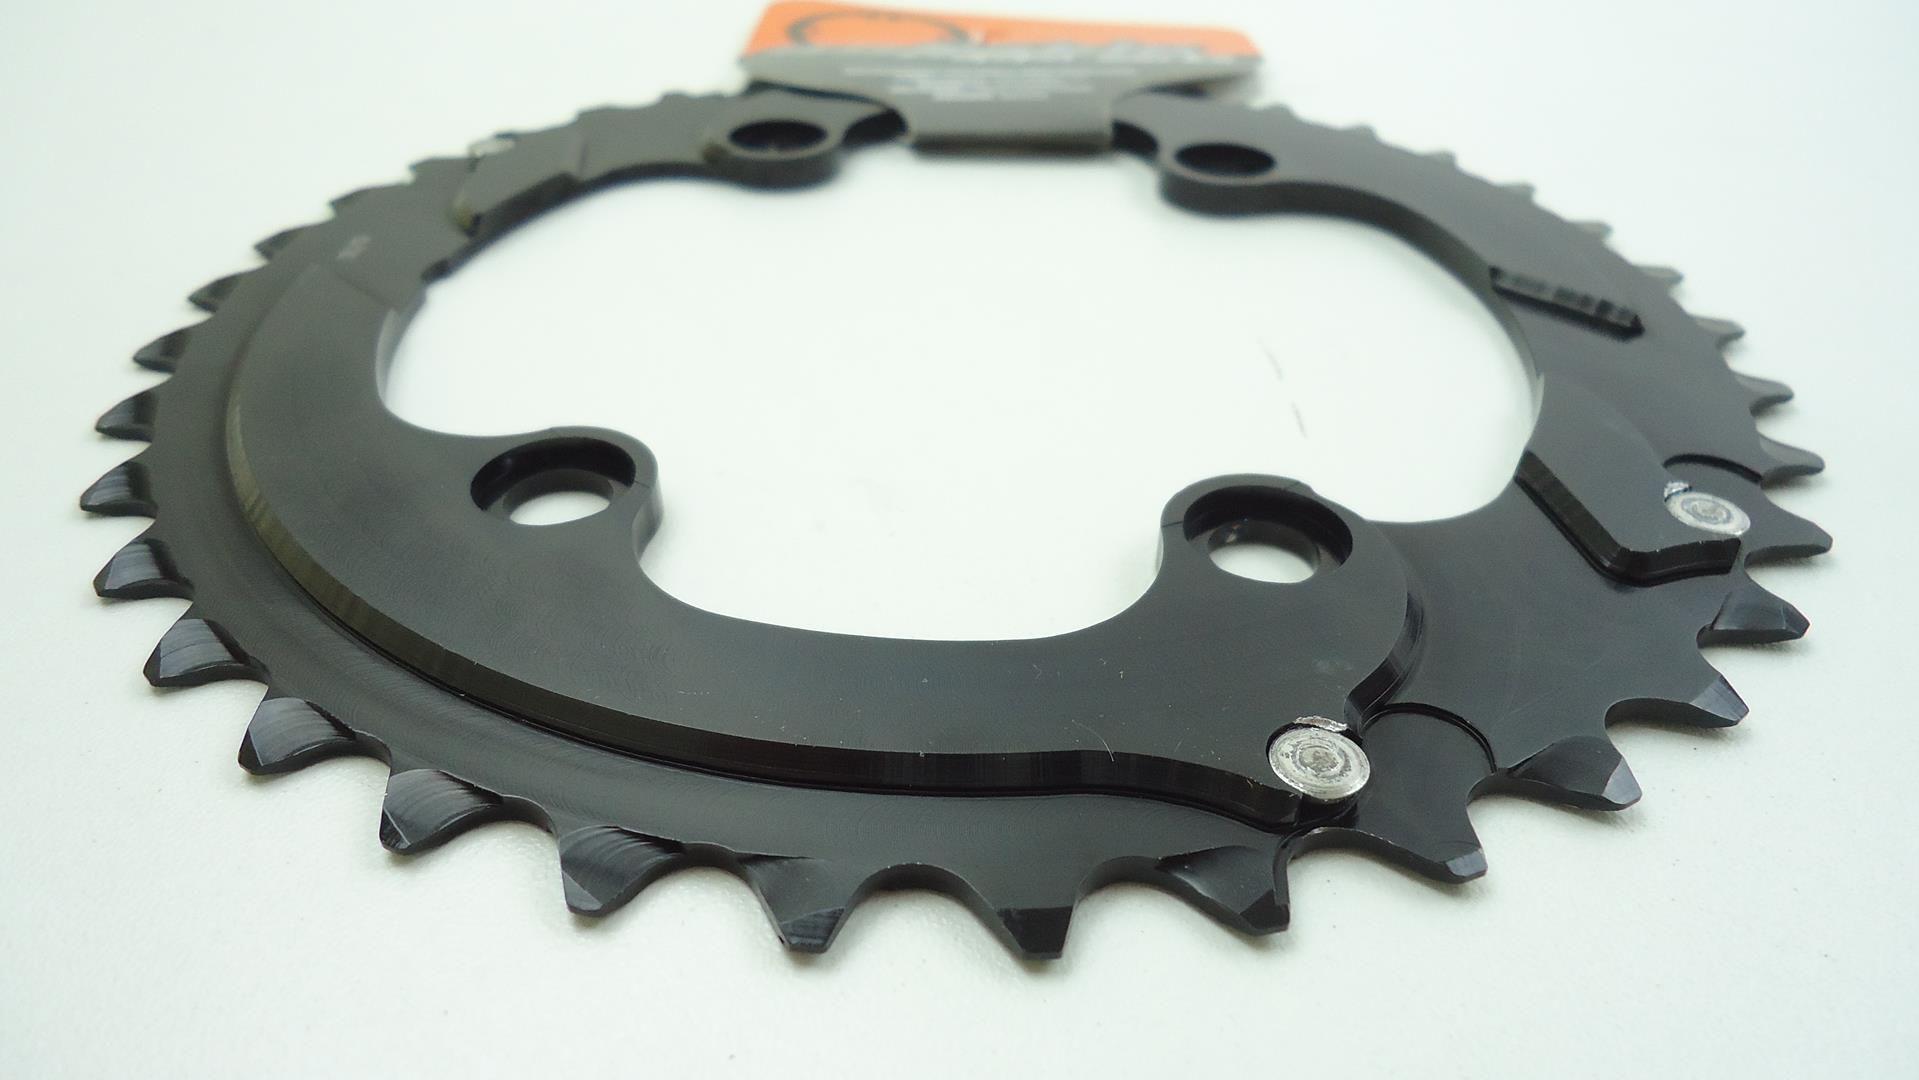 Coroa Dupla Mtb Nottable 34/36/38 dentes 2x11 Shimano XT M8000 SLX M7000 Deore M6000 MT500